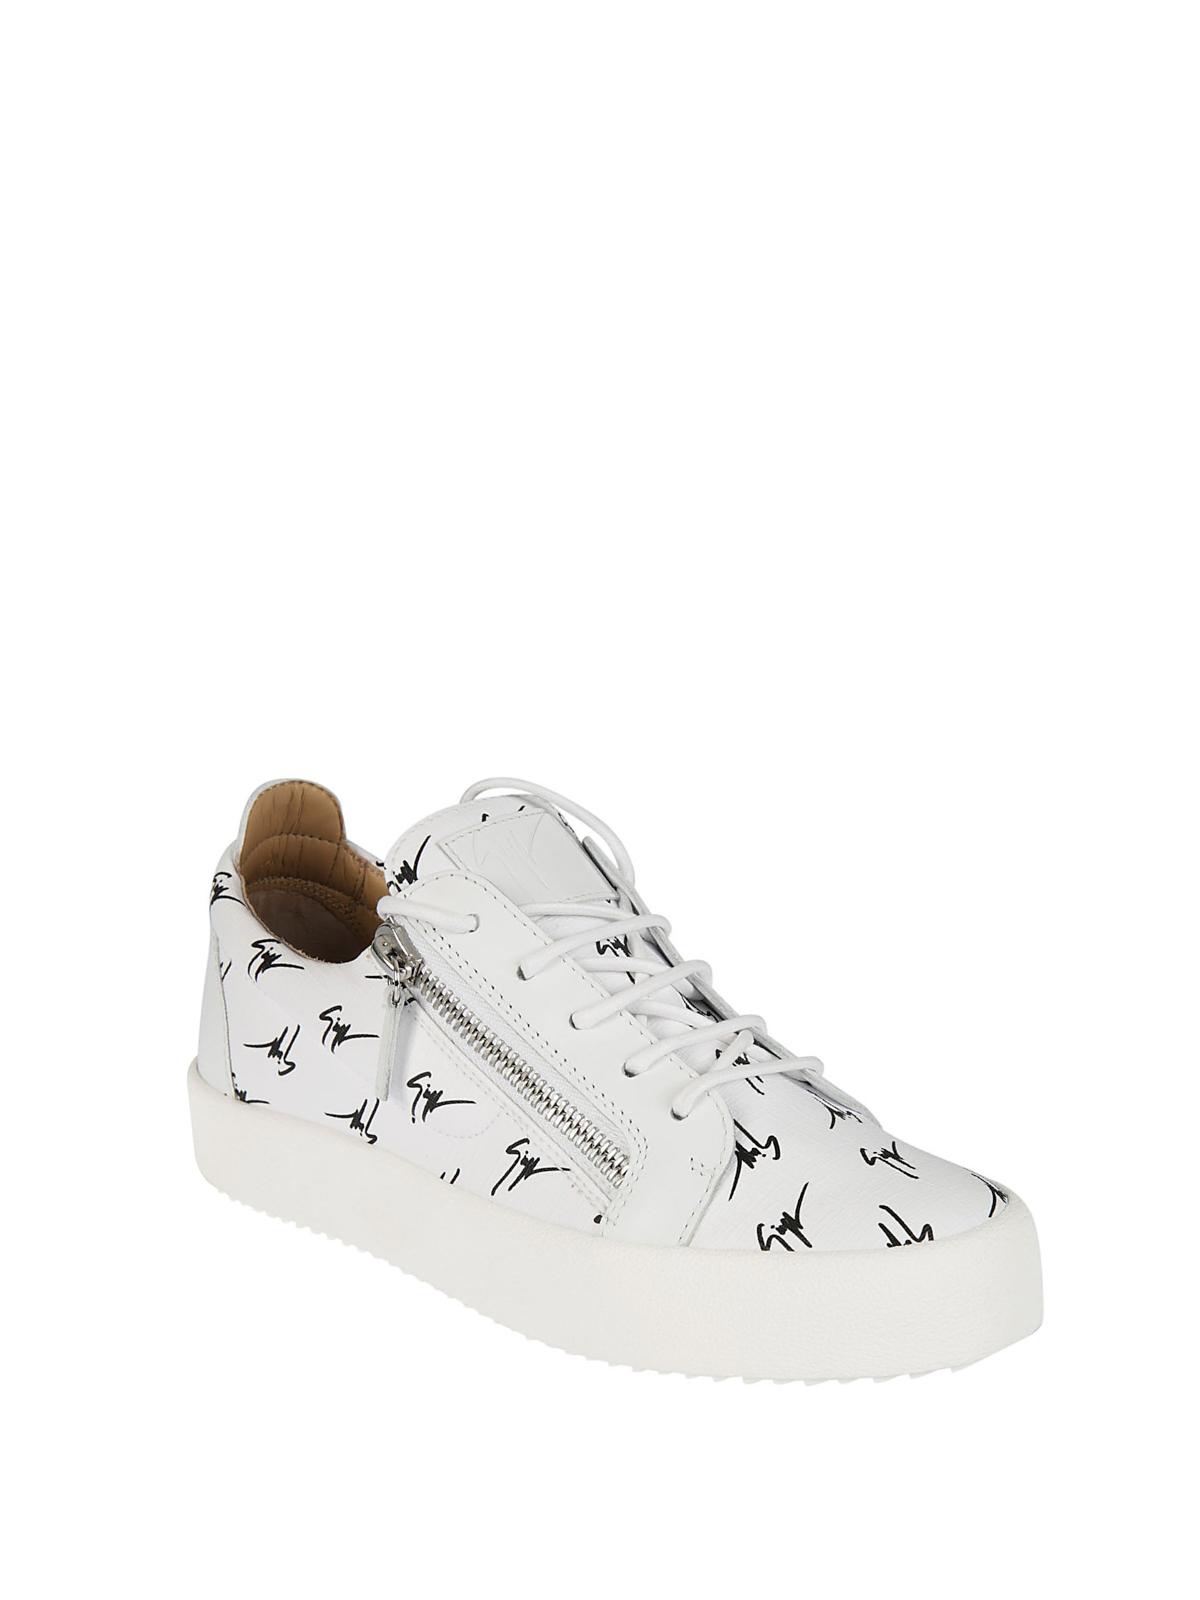 Rm80030001 Zanotti Zanotti Giuseppe Giuseppe Weiß Sneaker Sneaker Rm80030001 Weiß vnN0m8w